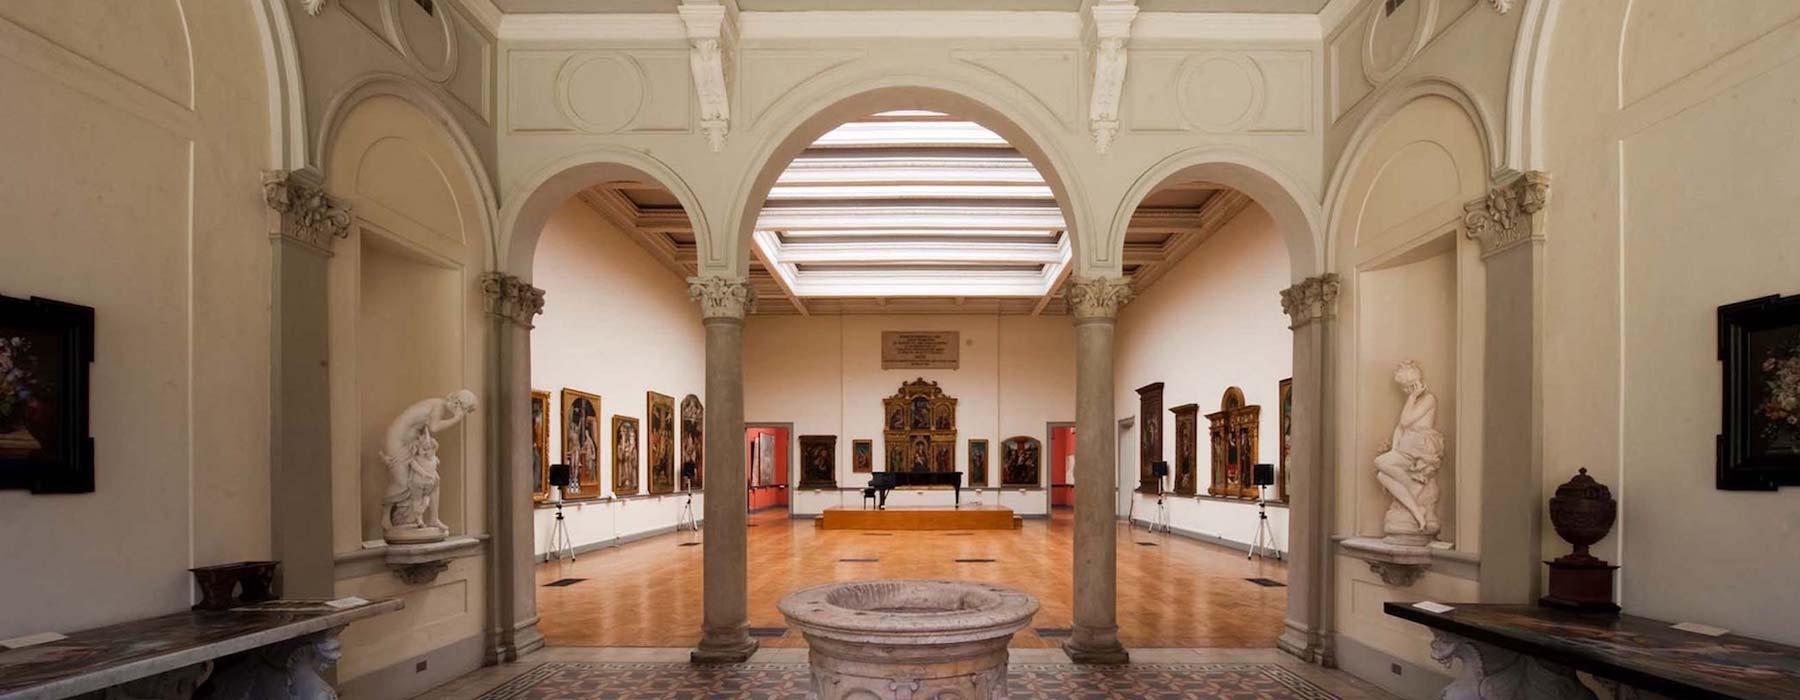 Museo_Borgogna_Home_Page_Slider_01_1800x700